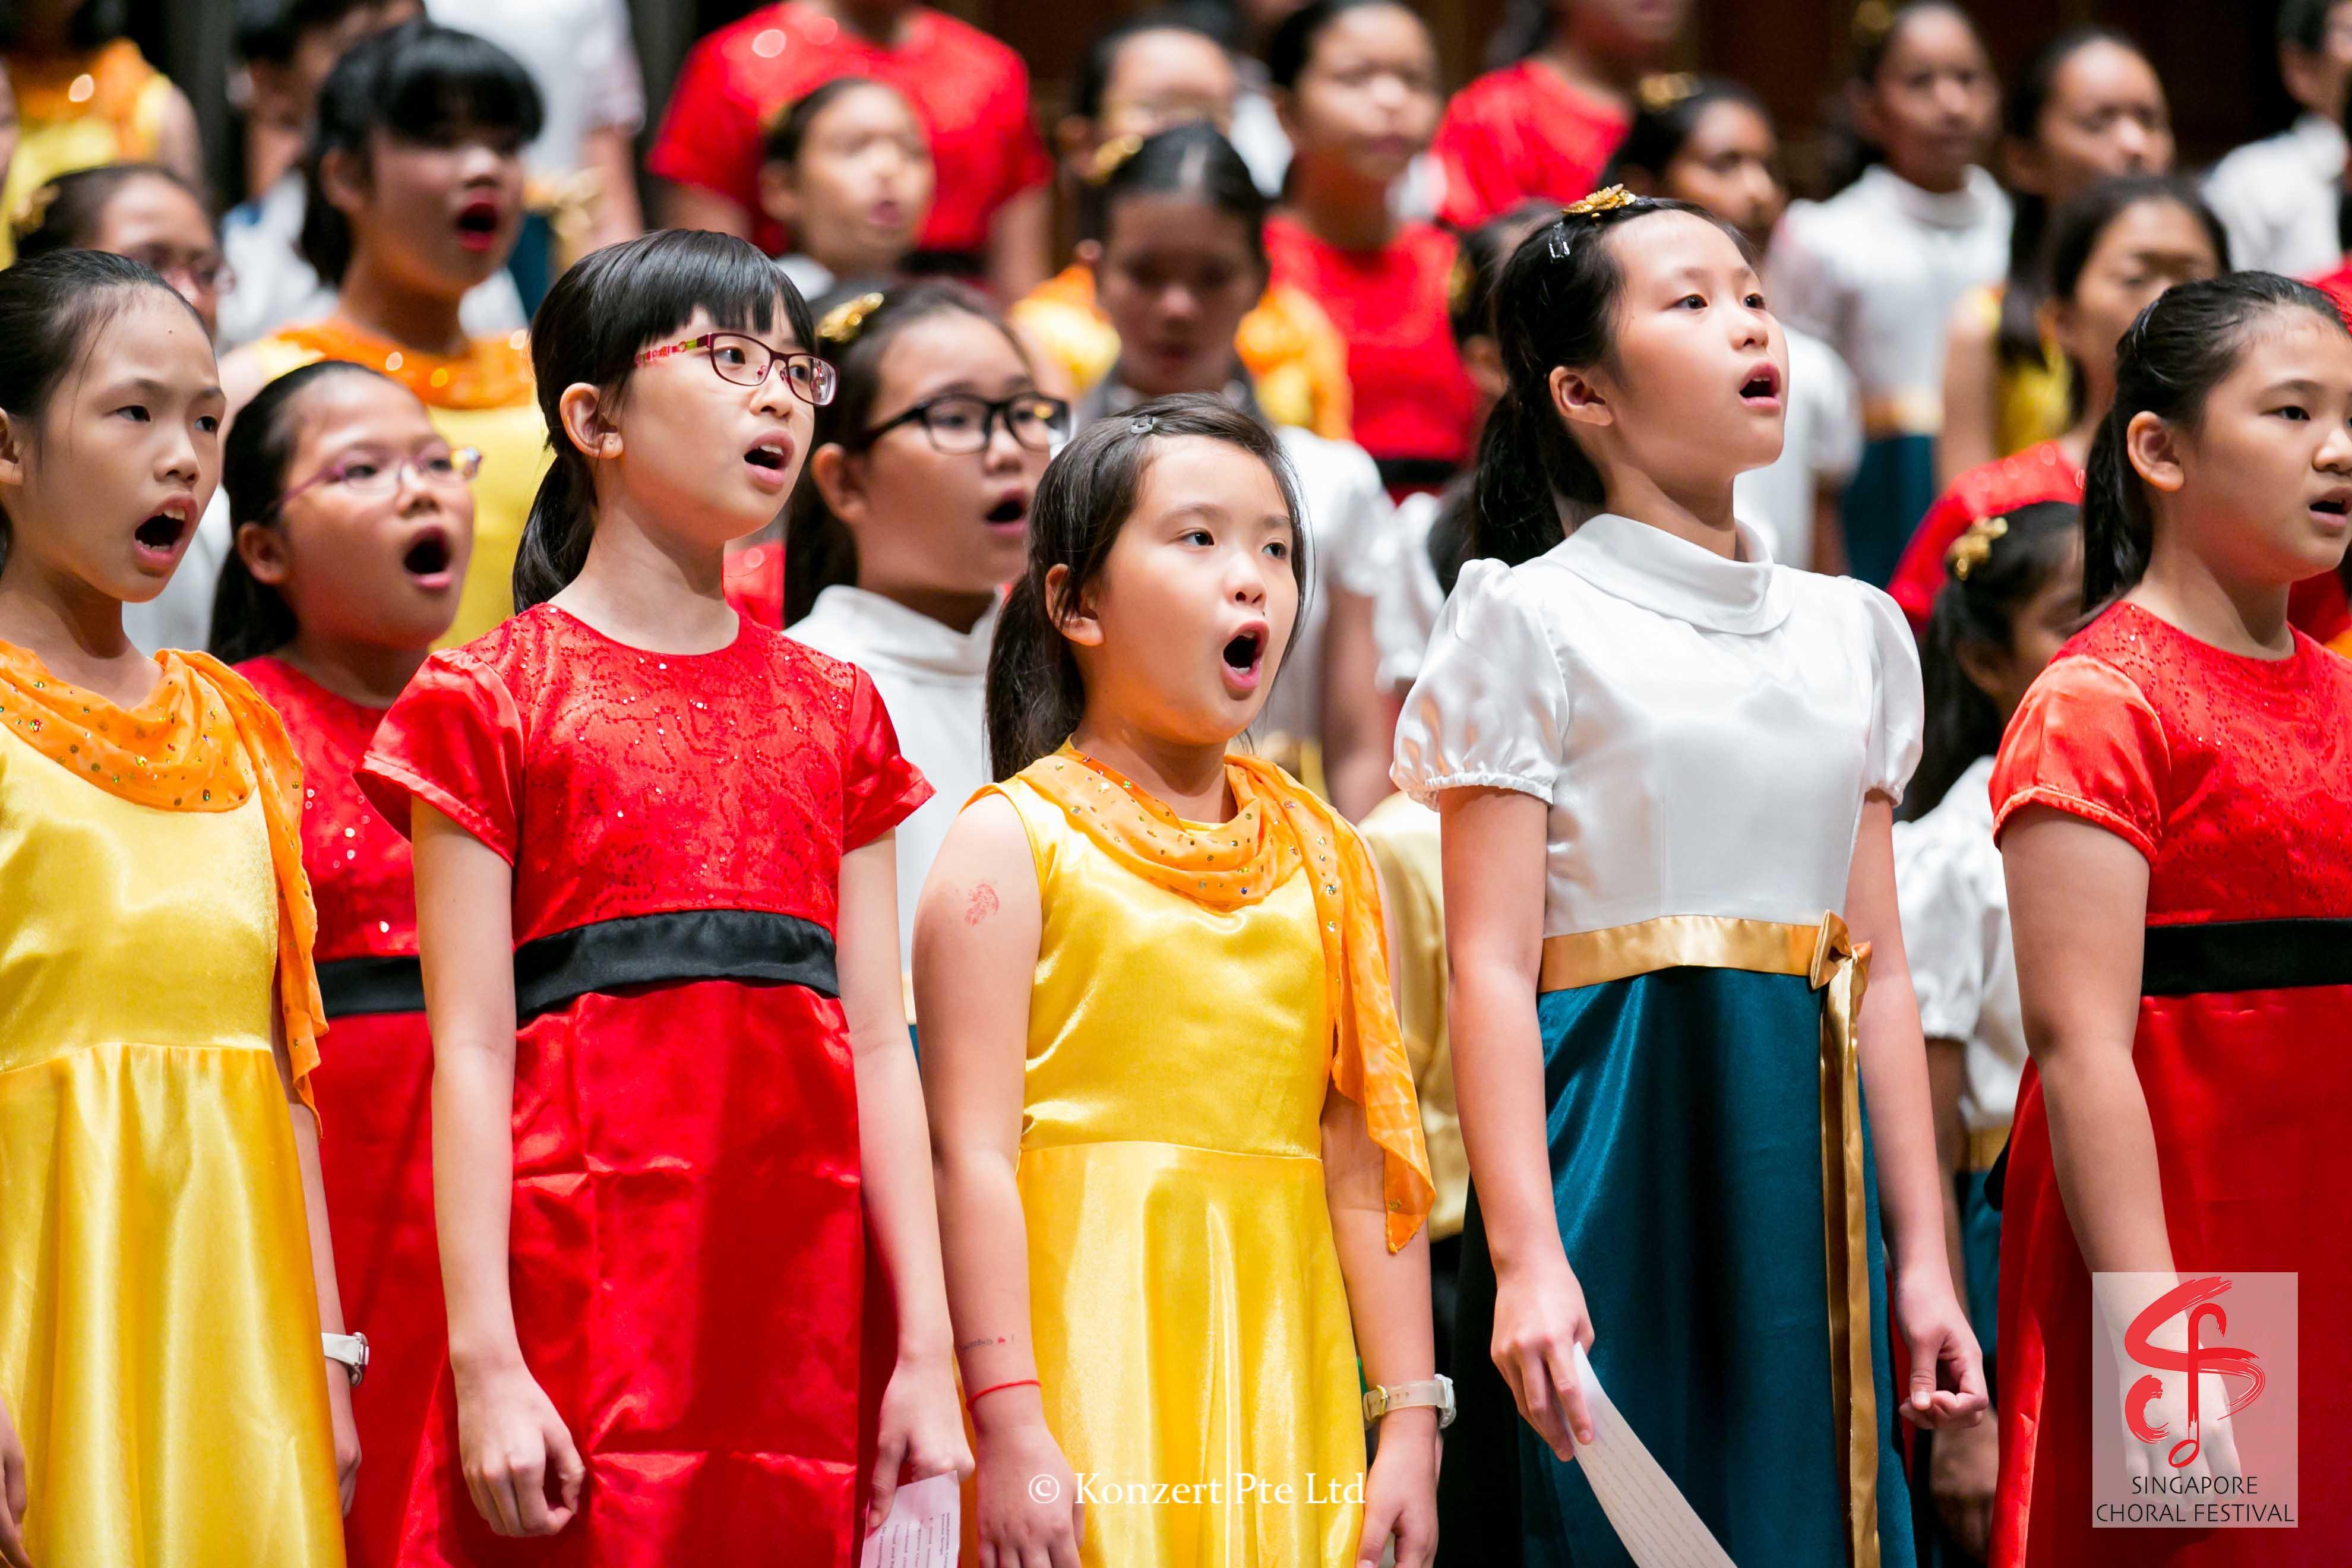 Singapore Choral Festival 7-8-15 (2).jpg